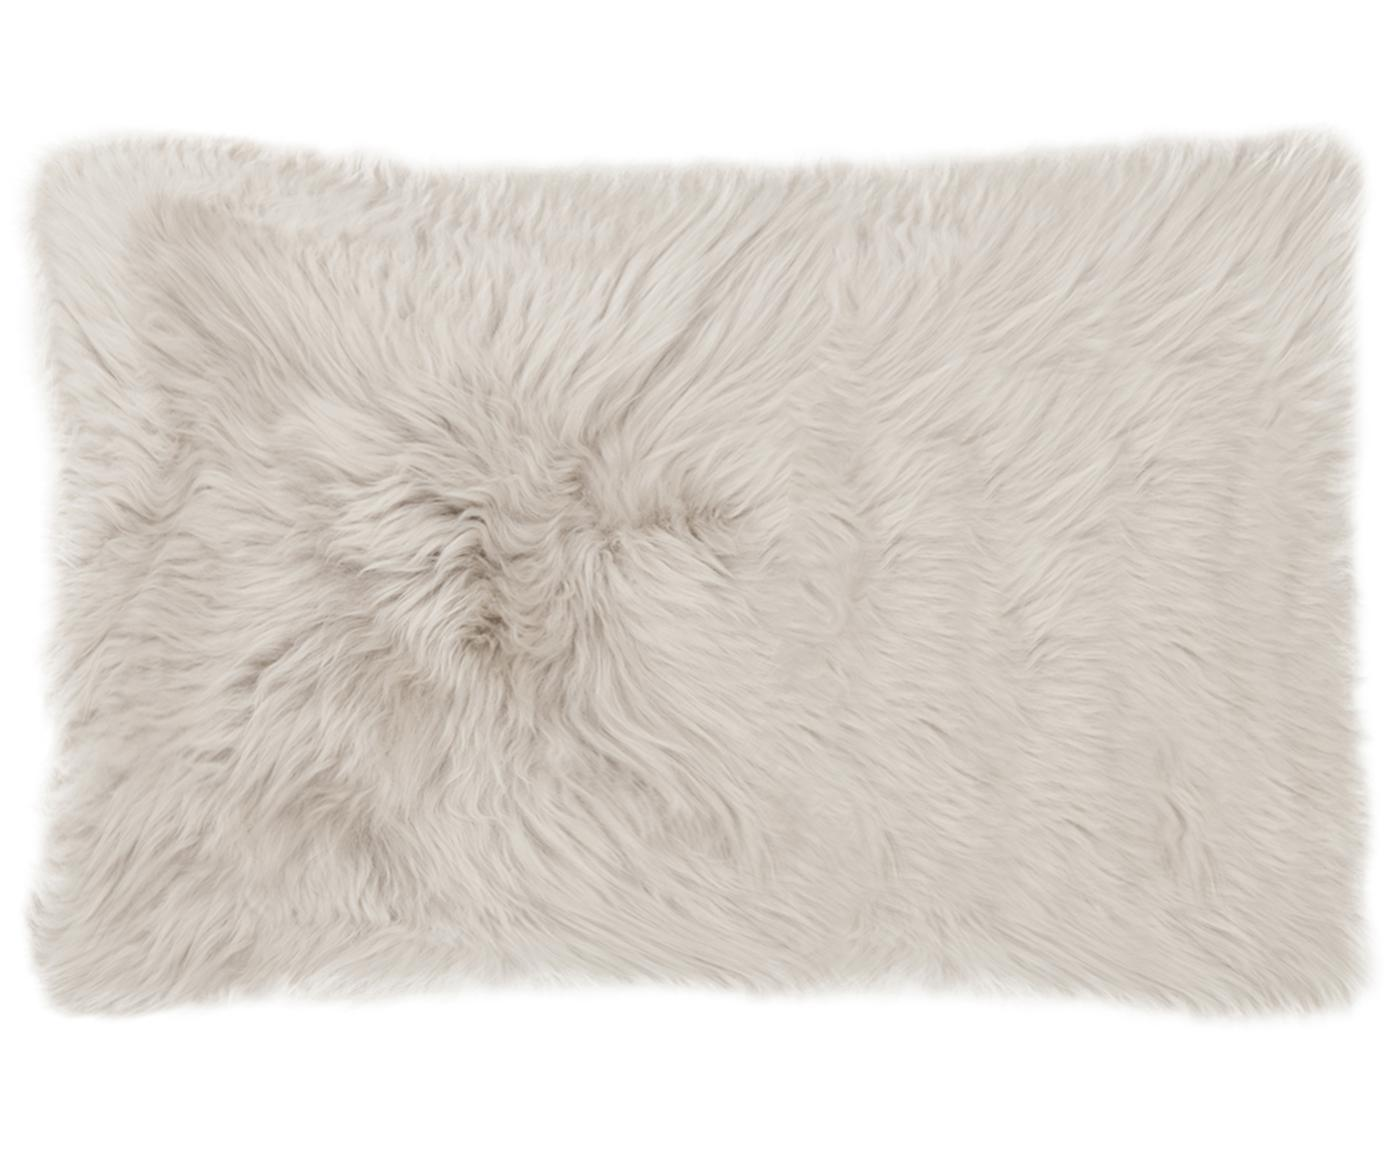 Schaffell-Kissenhülle Oslo, glatt, Vorderseite: 100% Schaffell, Rückseite: Leinen, Vorderseite: BeigeRückseite: Hellgrau, 30 x 50 cm